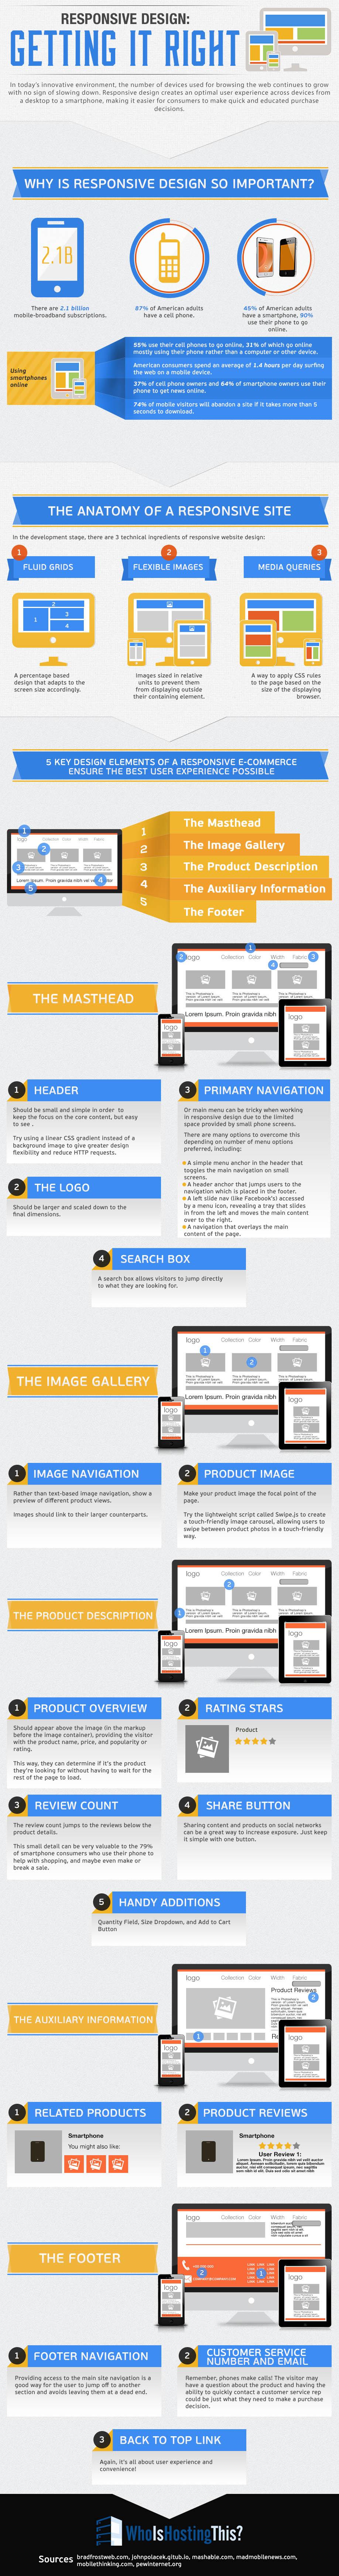 infographic-responsive-design-6001